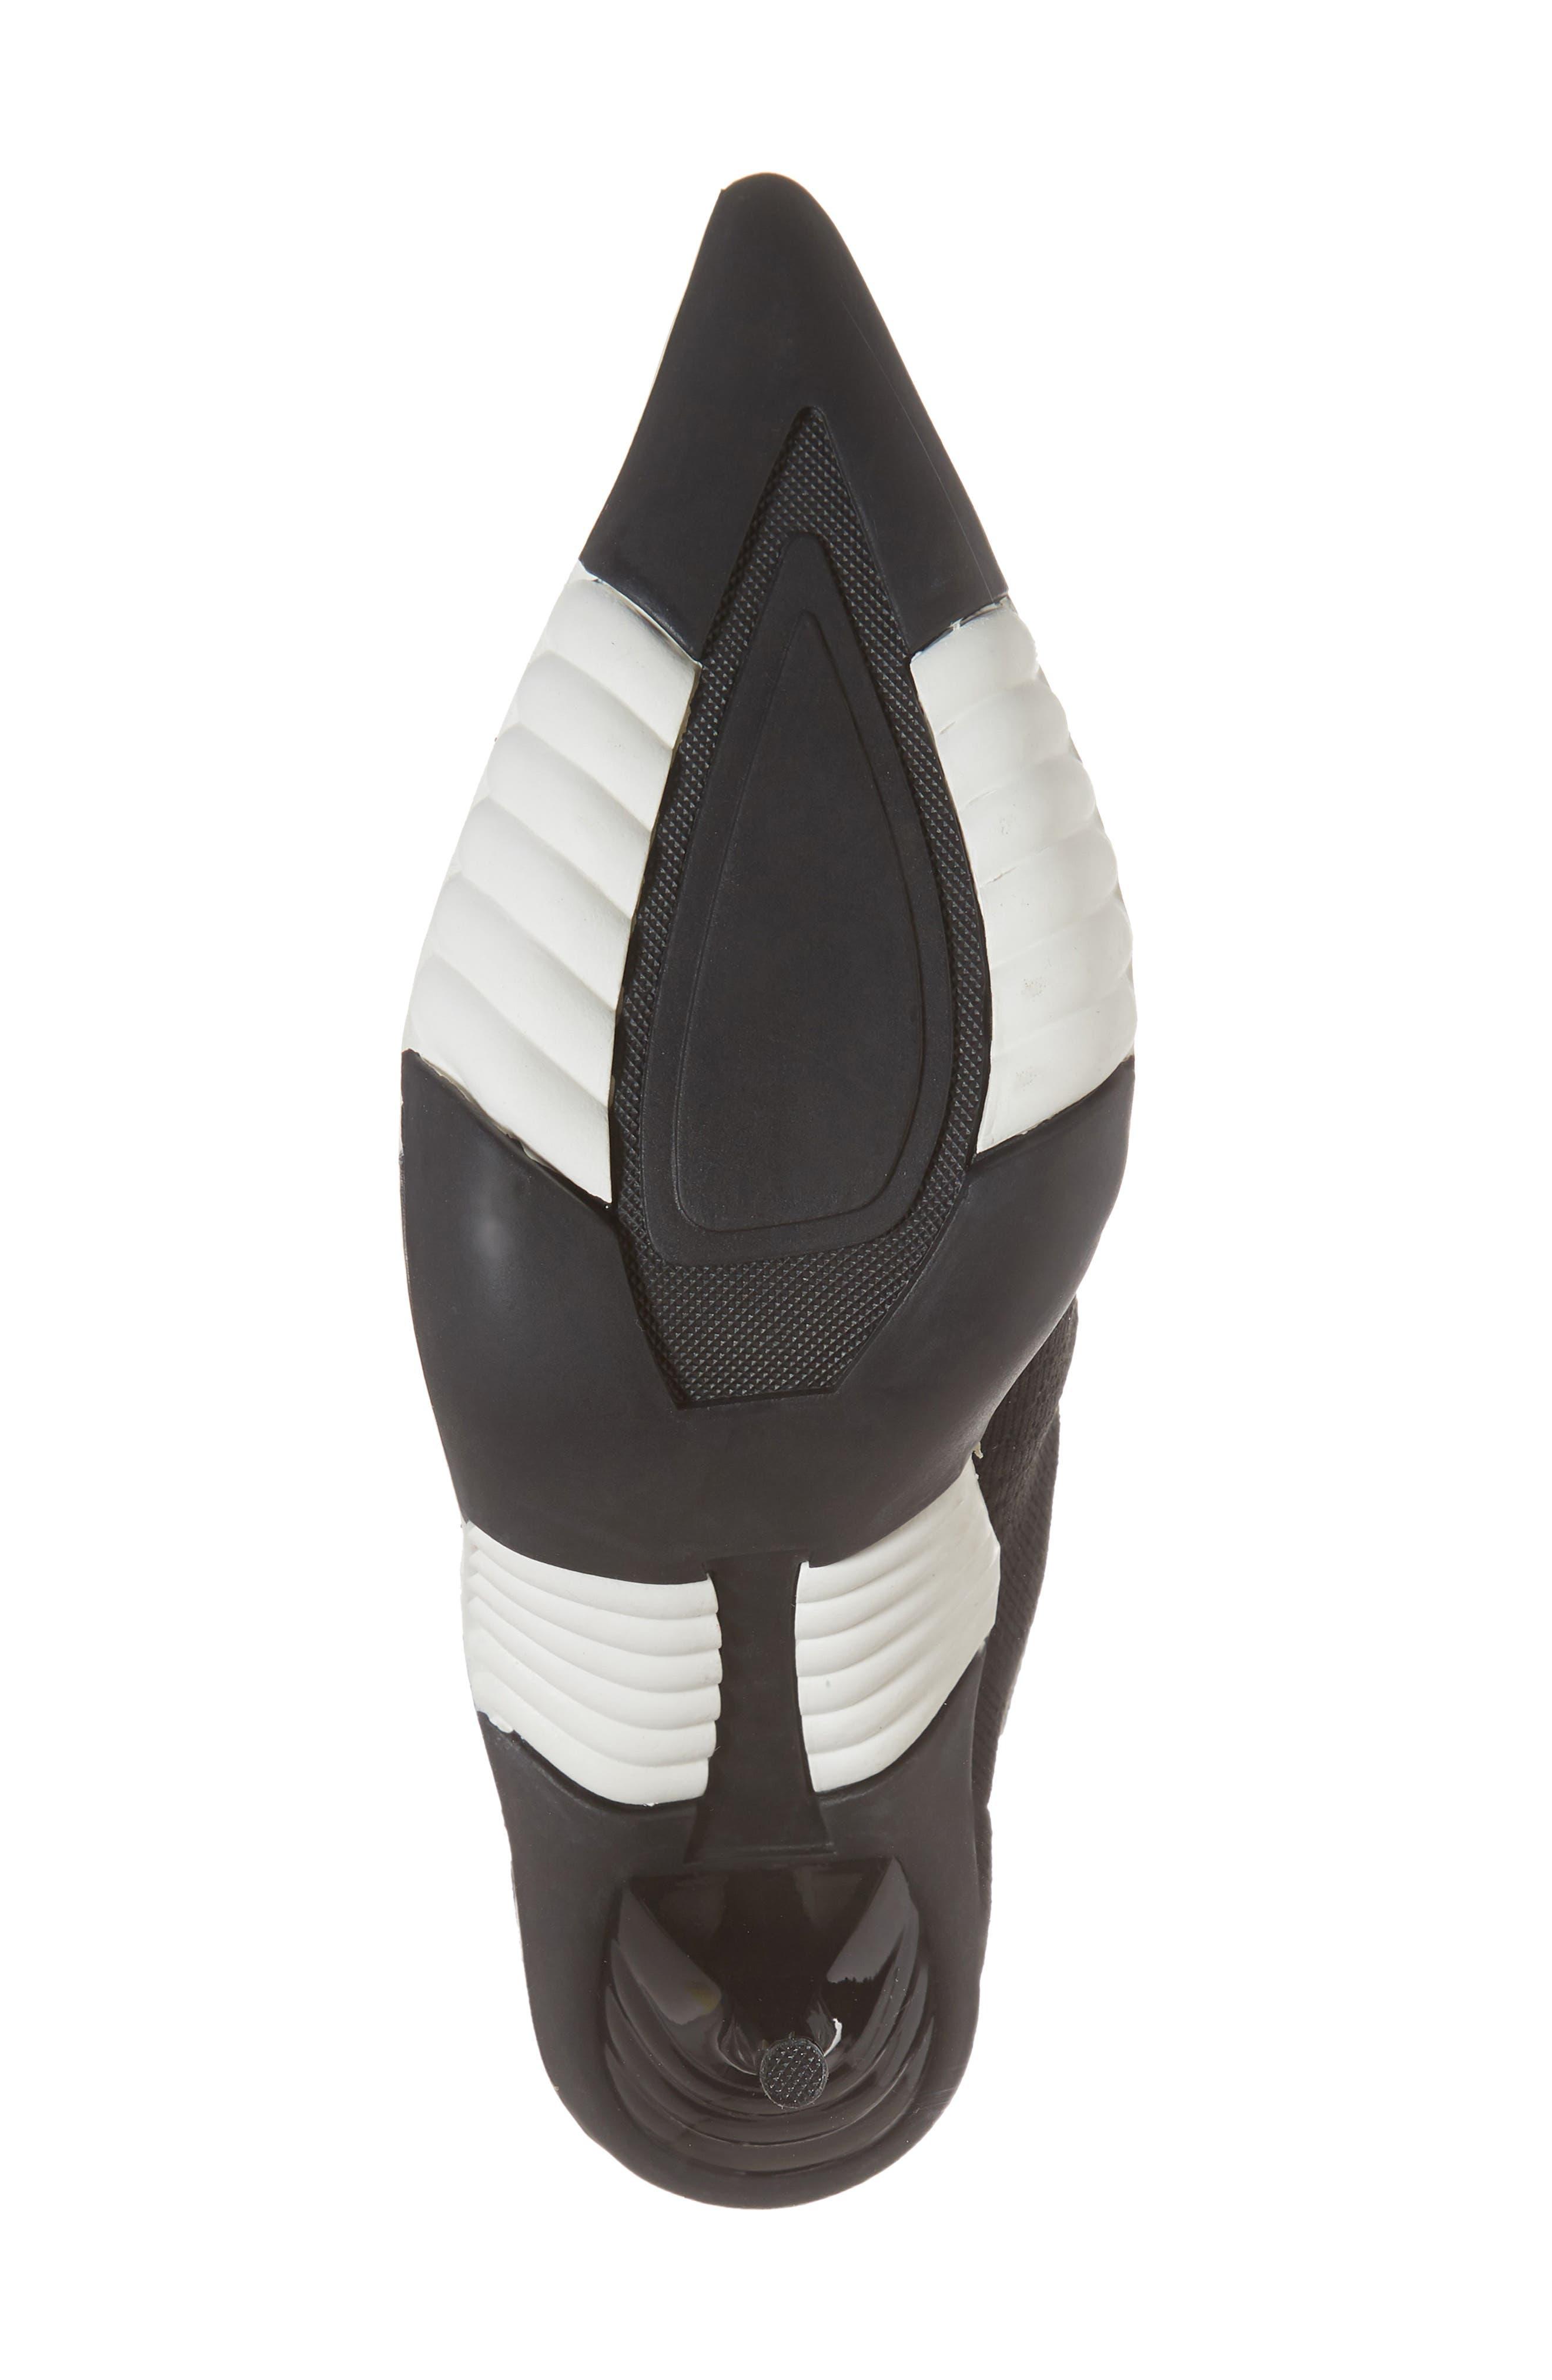 JEFFREY CAMPBELL, Goal Sock Sneaker Bootie, Alternate thumbnail 6, color, BLACK/ WHITE FABRIC